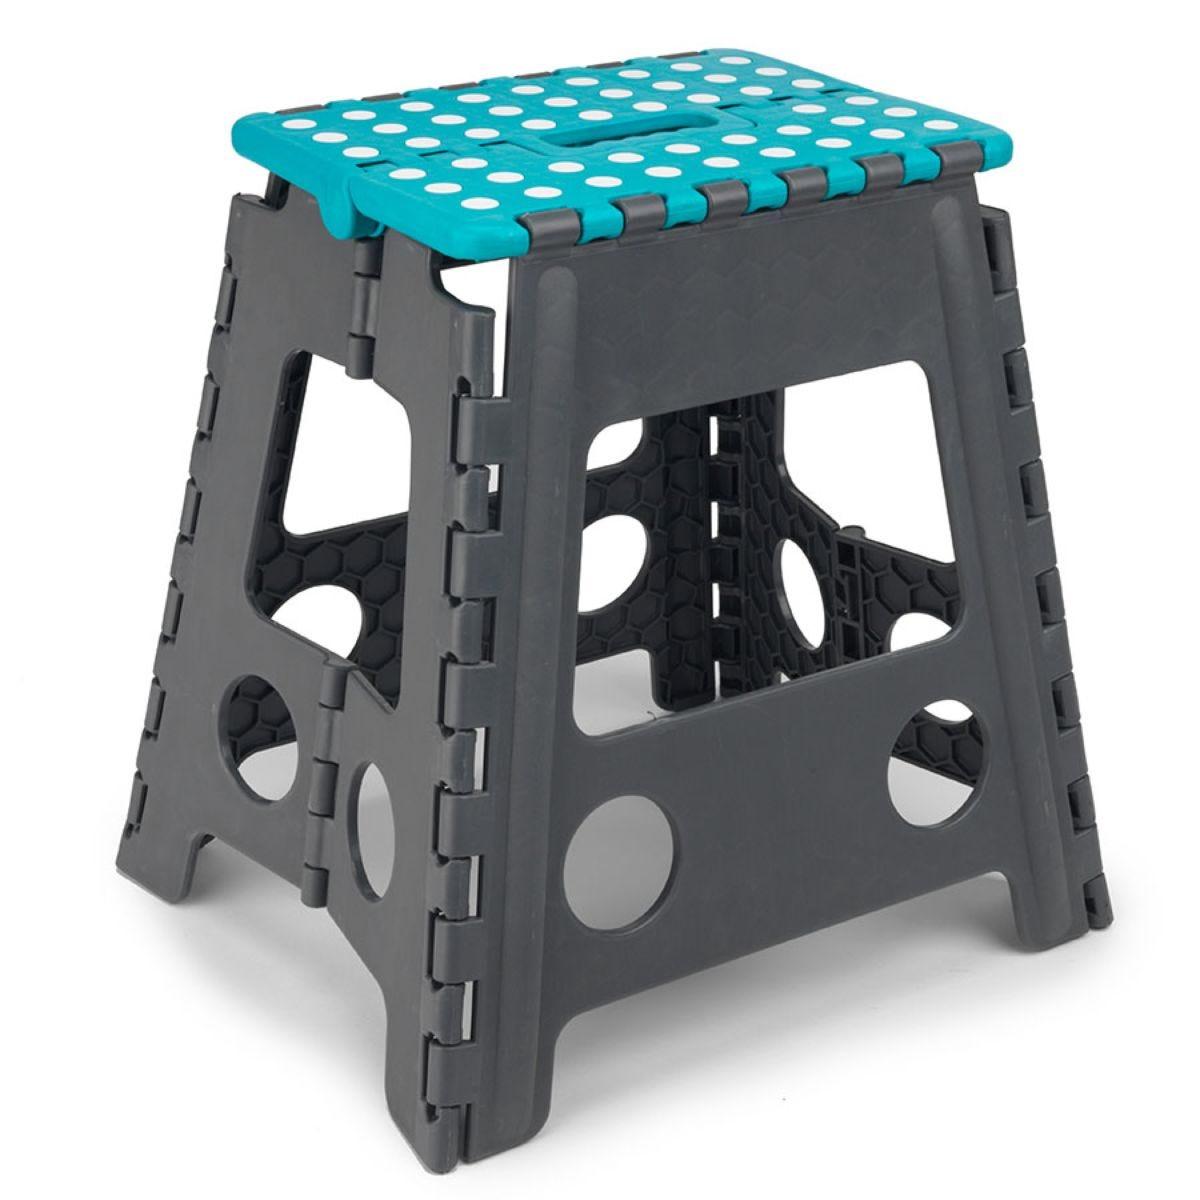 Beldray Large Plastic Hobby Step Stool – Turquoise